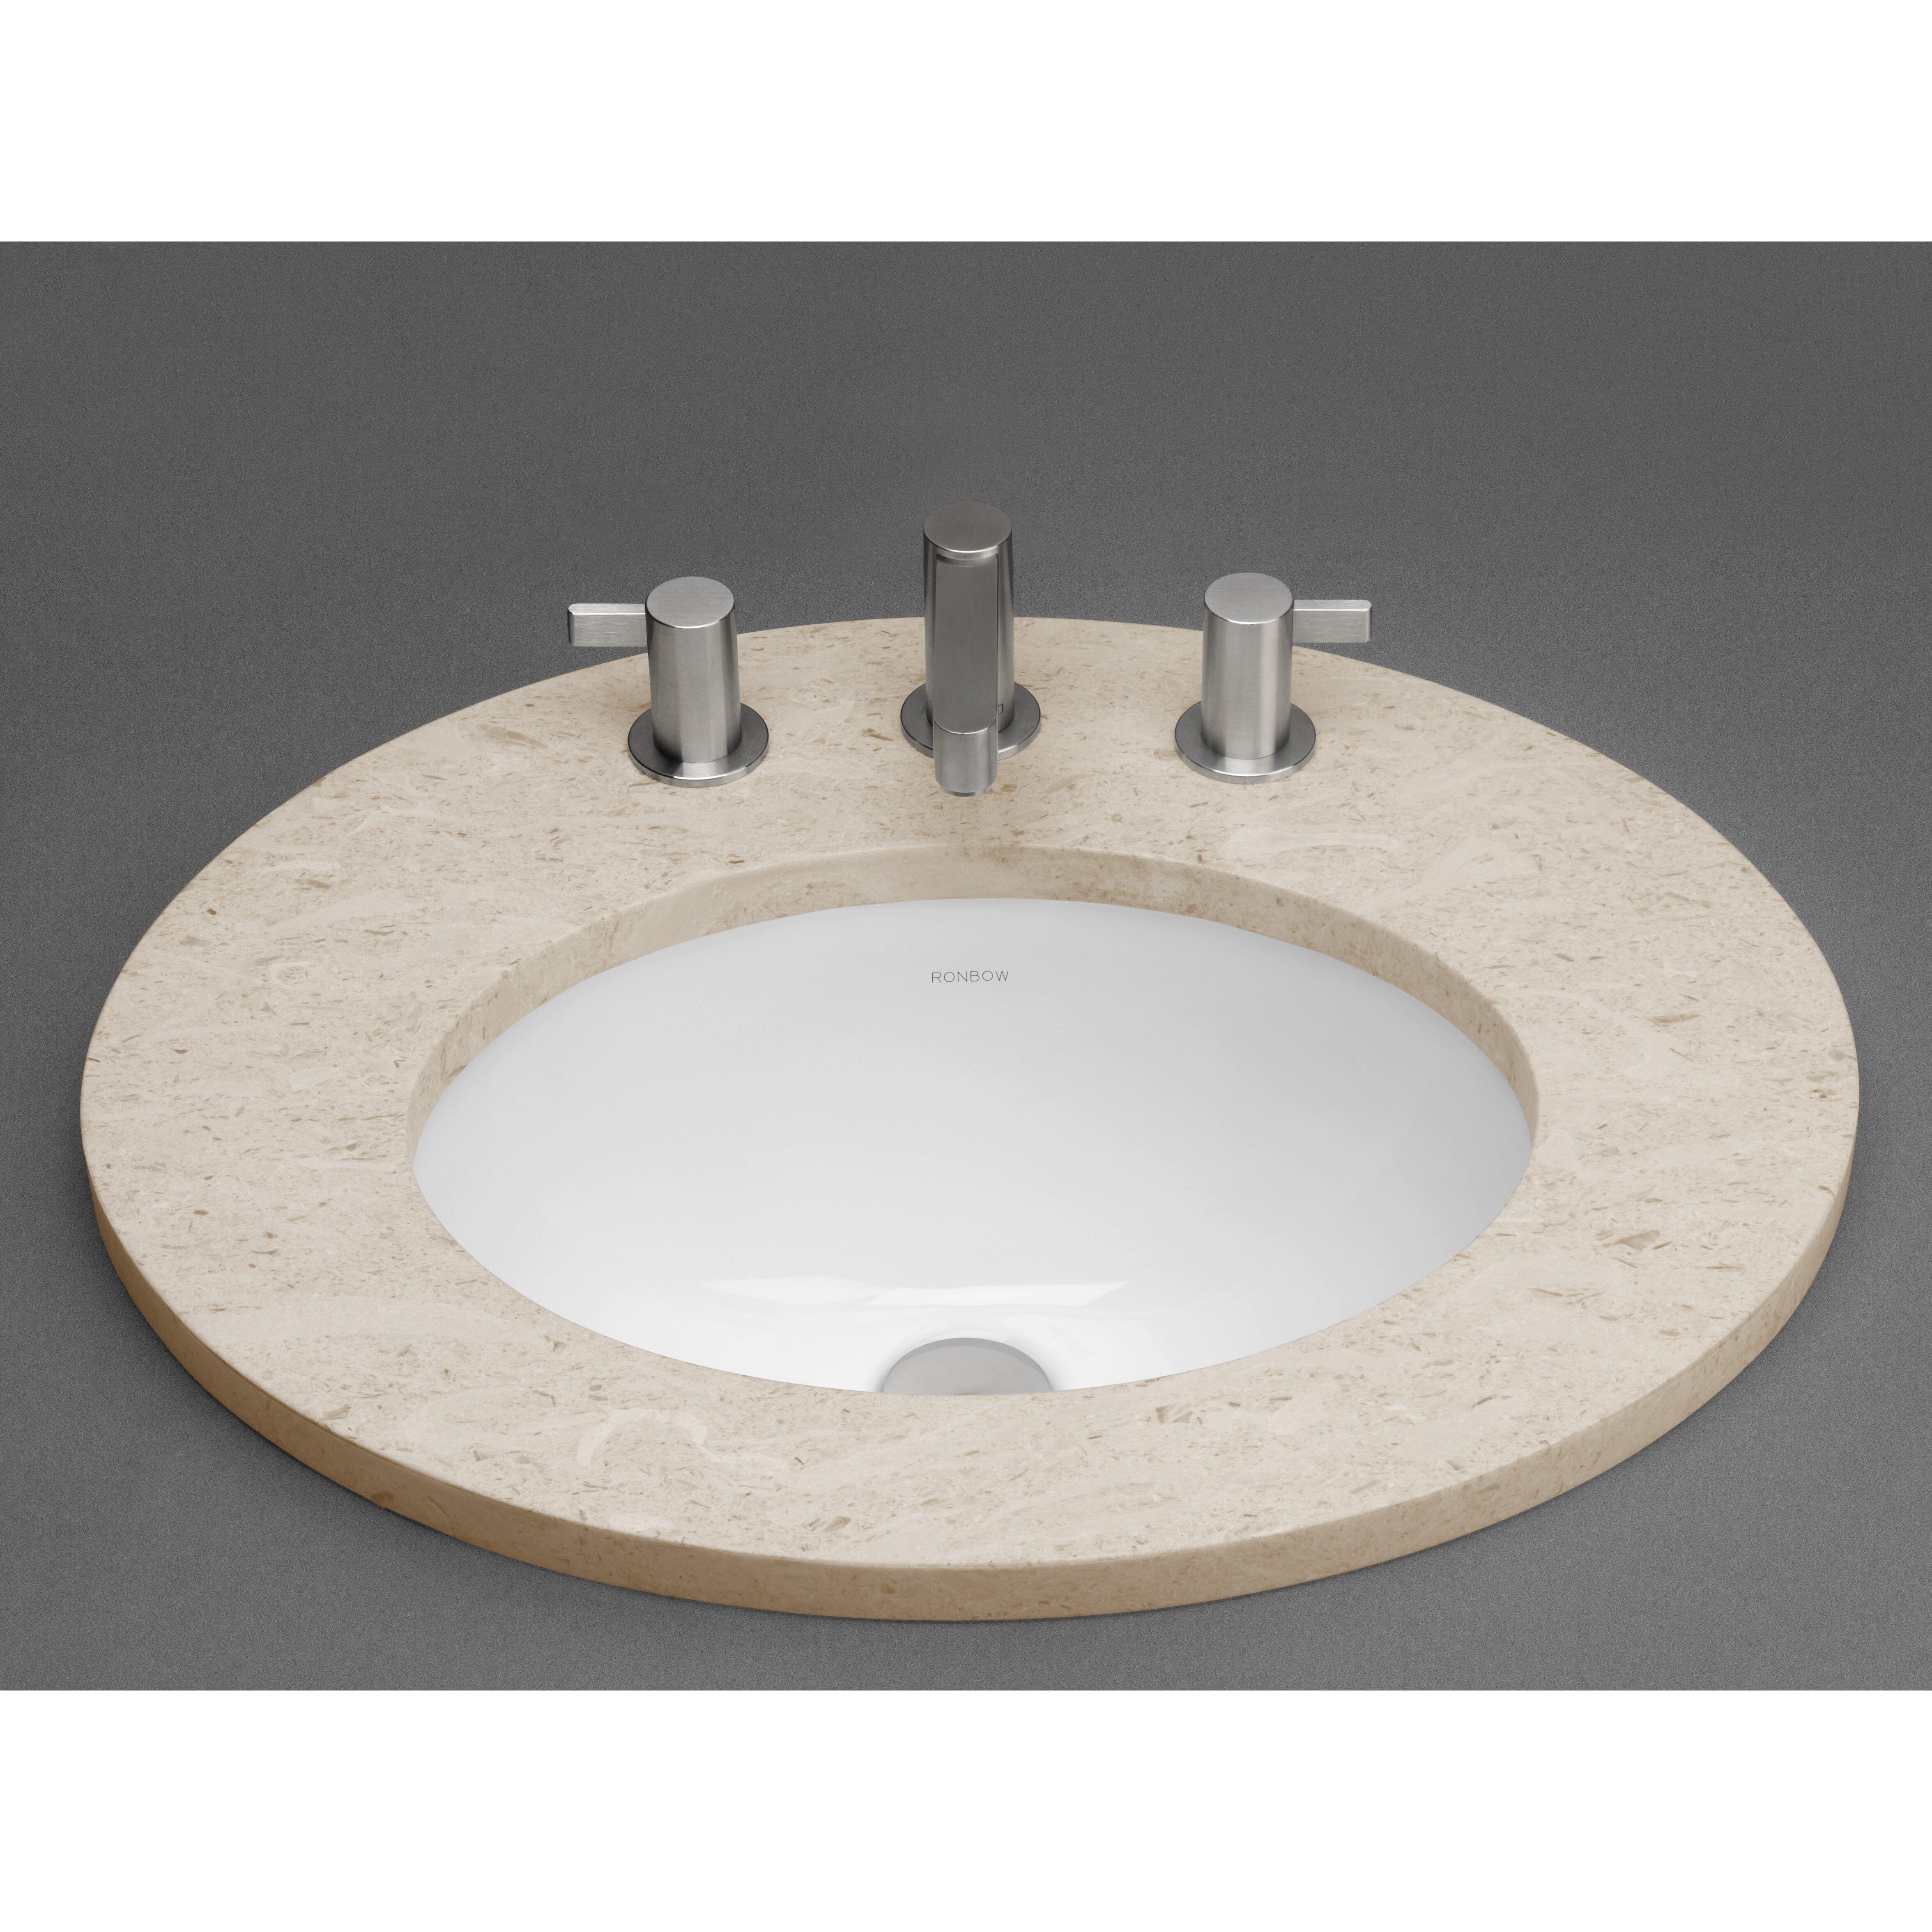 ronbow oval ceramic undermount bathroom sink in white